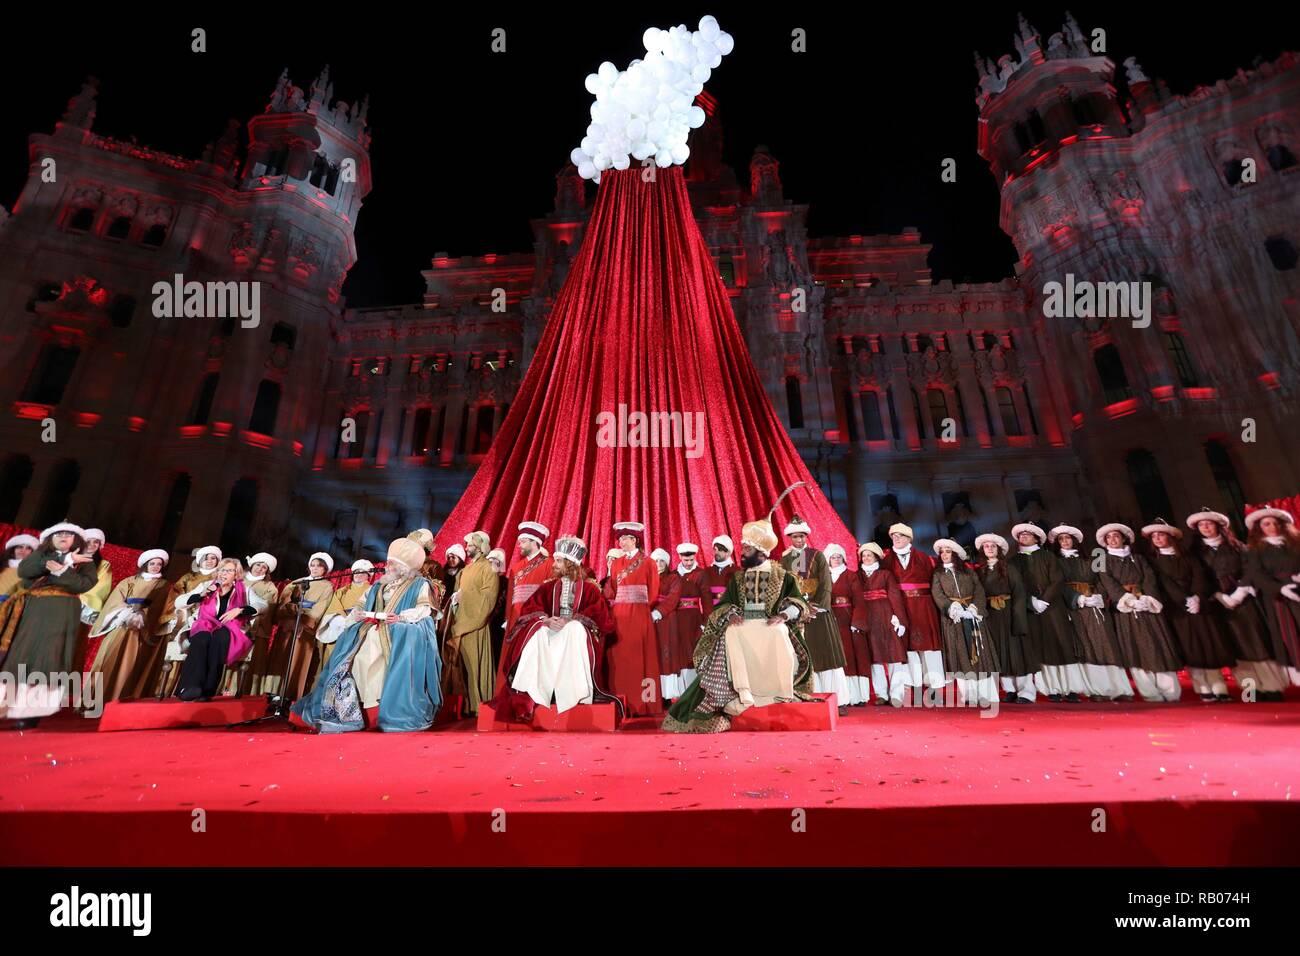 Mayors Christmas Parade 2019 Madrid, Spain. 05th Jan, 2019. Spain, 5th Jan, 2019. Madrid's